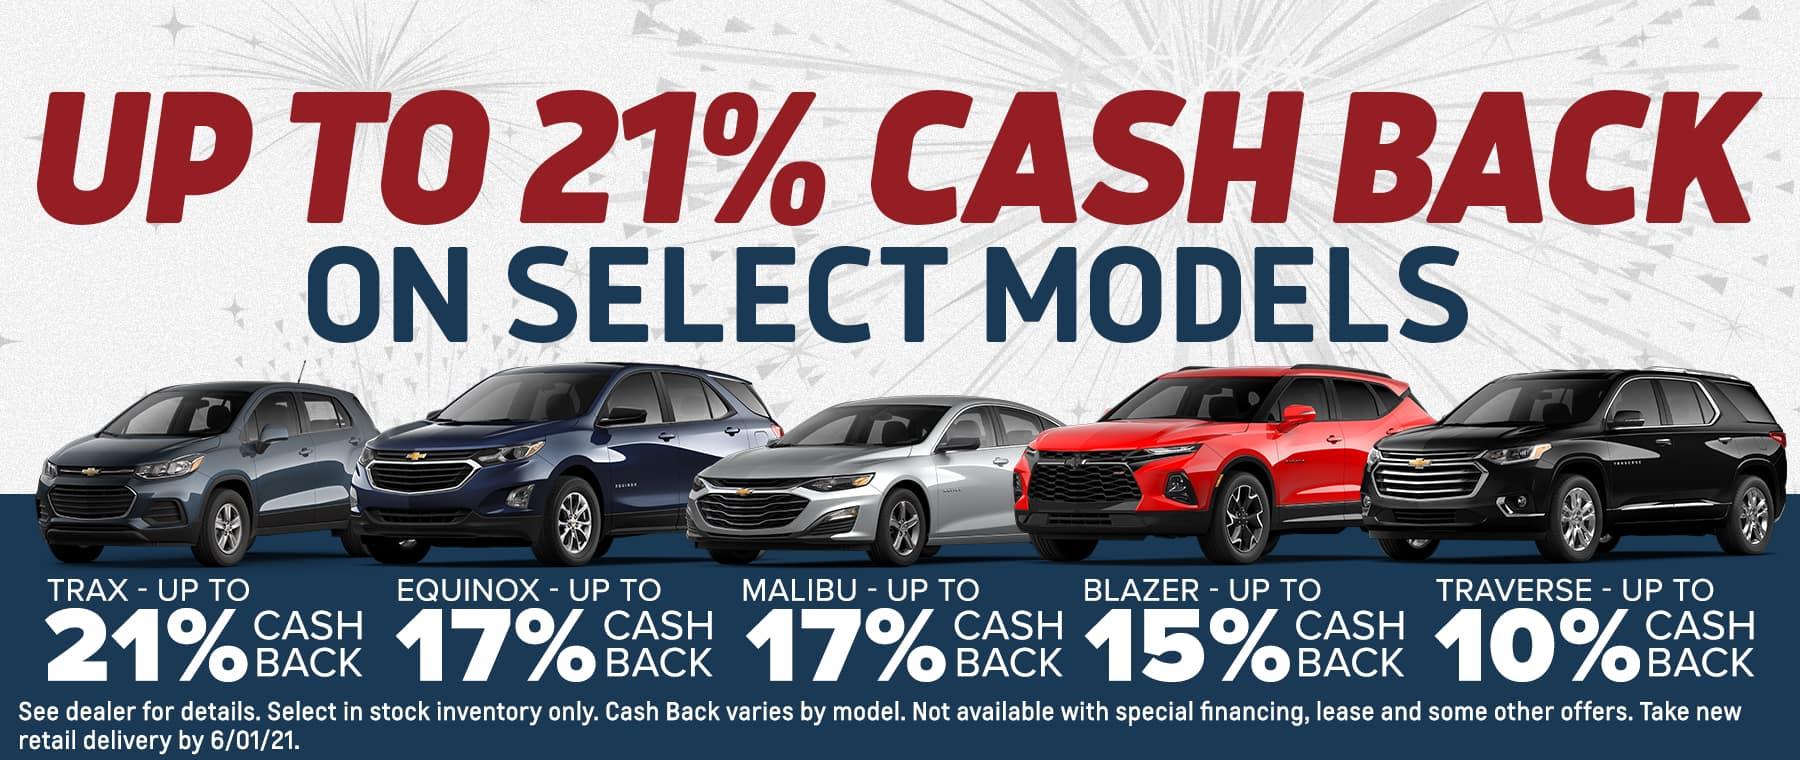 Up to 21% Cashback